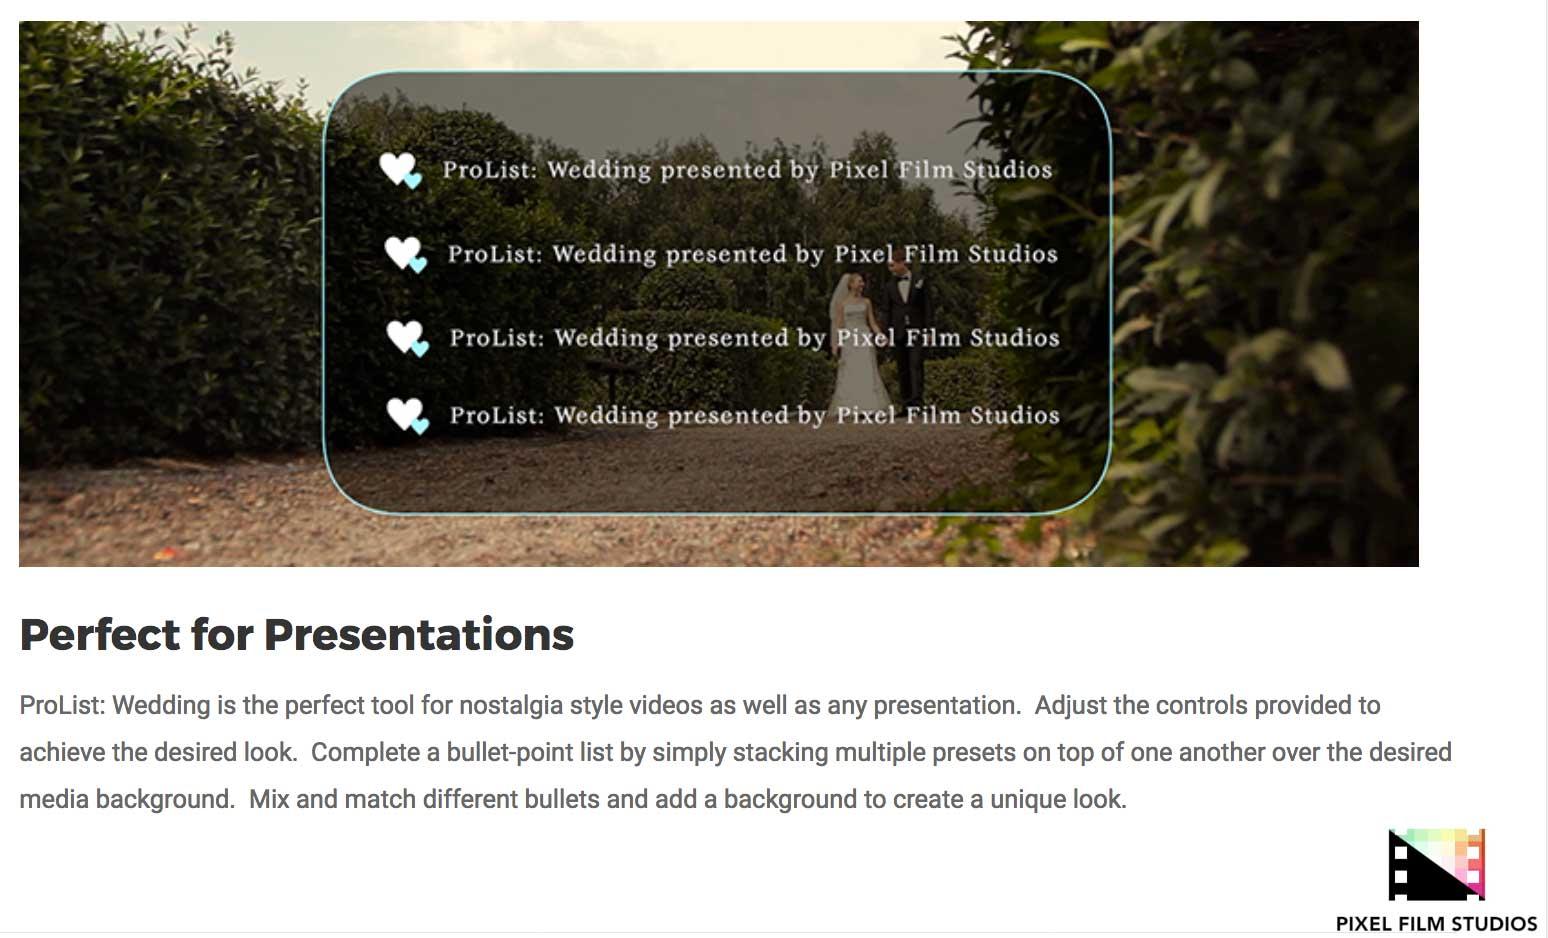 pixel film studios releases prolist wedding for fcpx